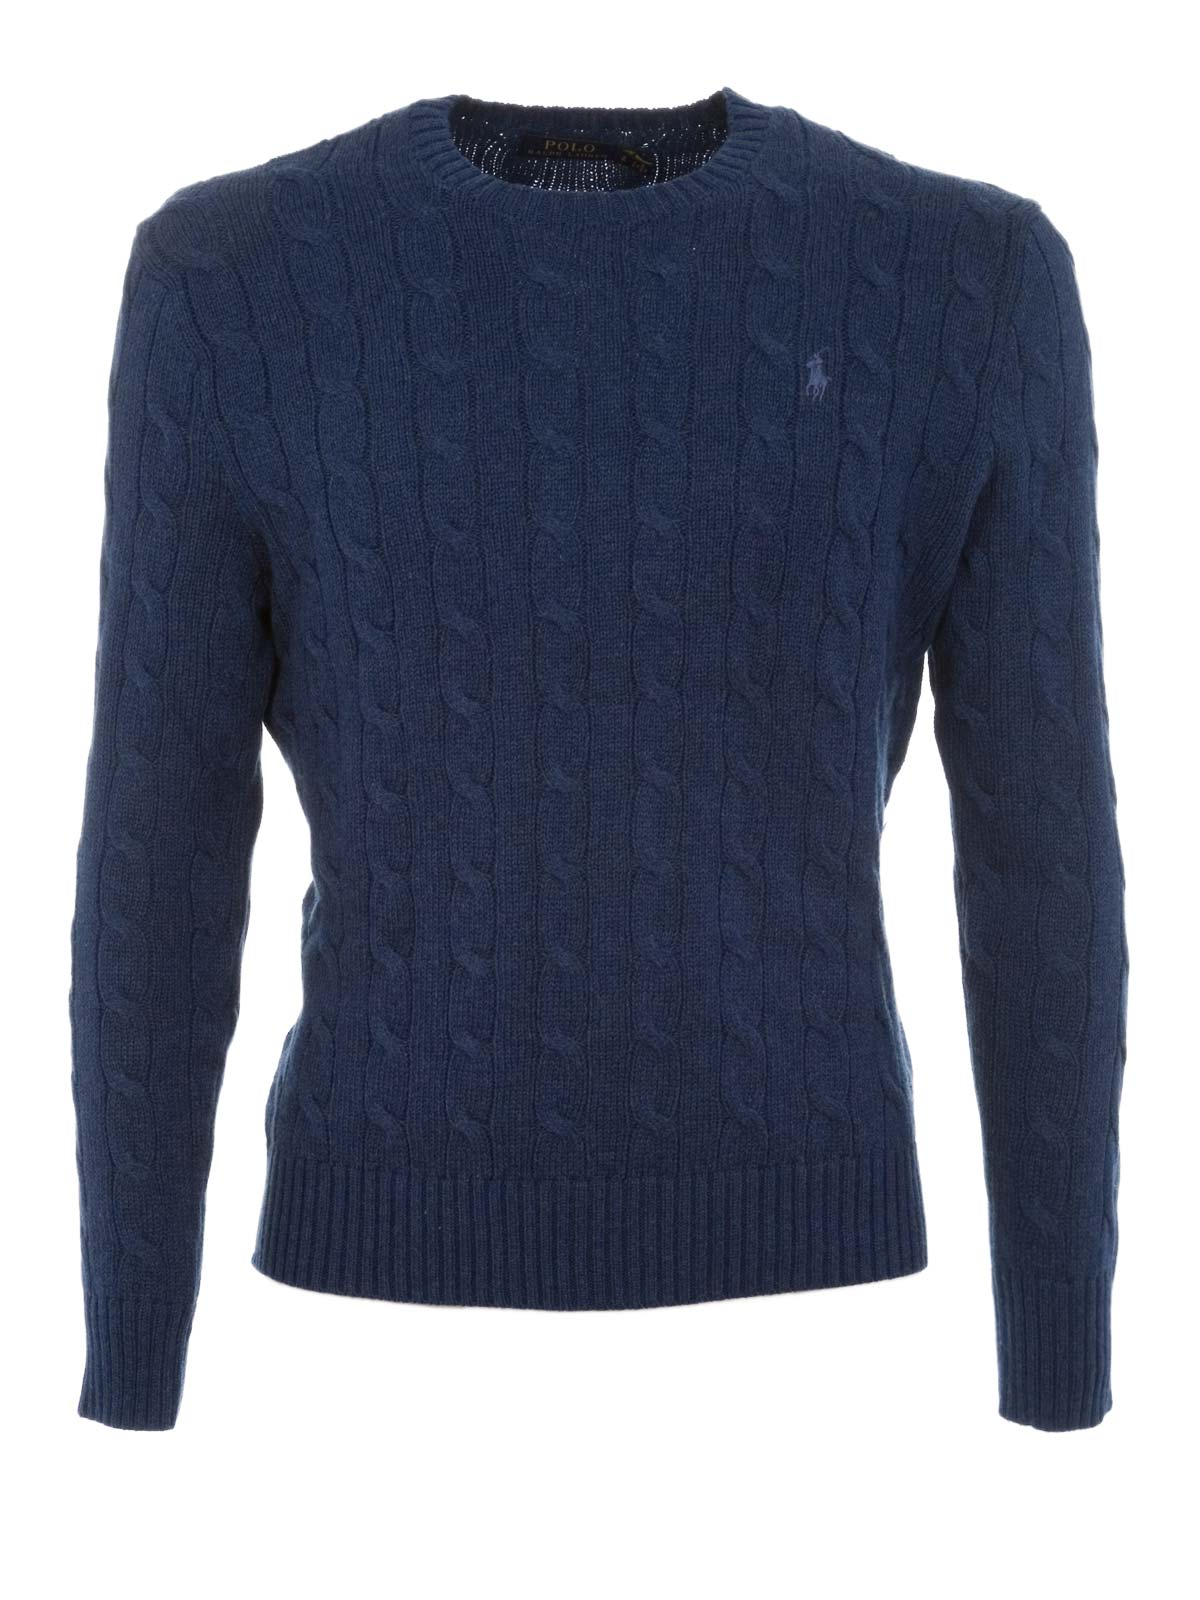 4144183dfcc9 POLO RALPH LAUREN Cable-Knit Cotone Sweater Campus Blue Heather ...